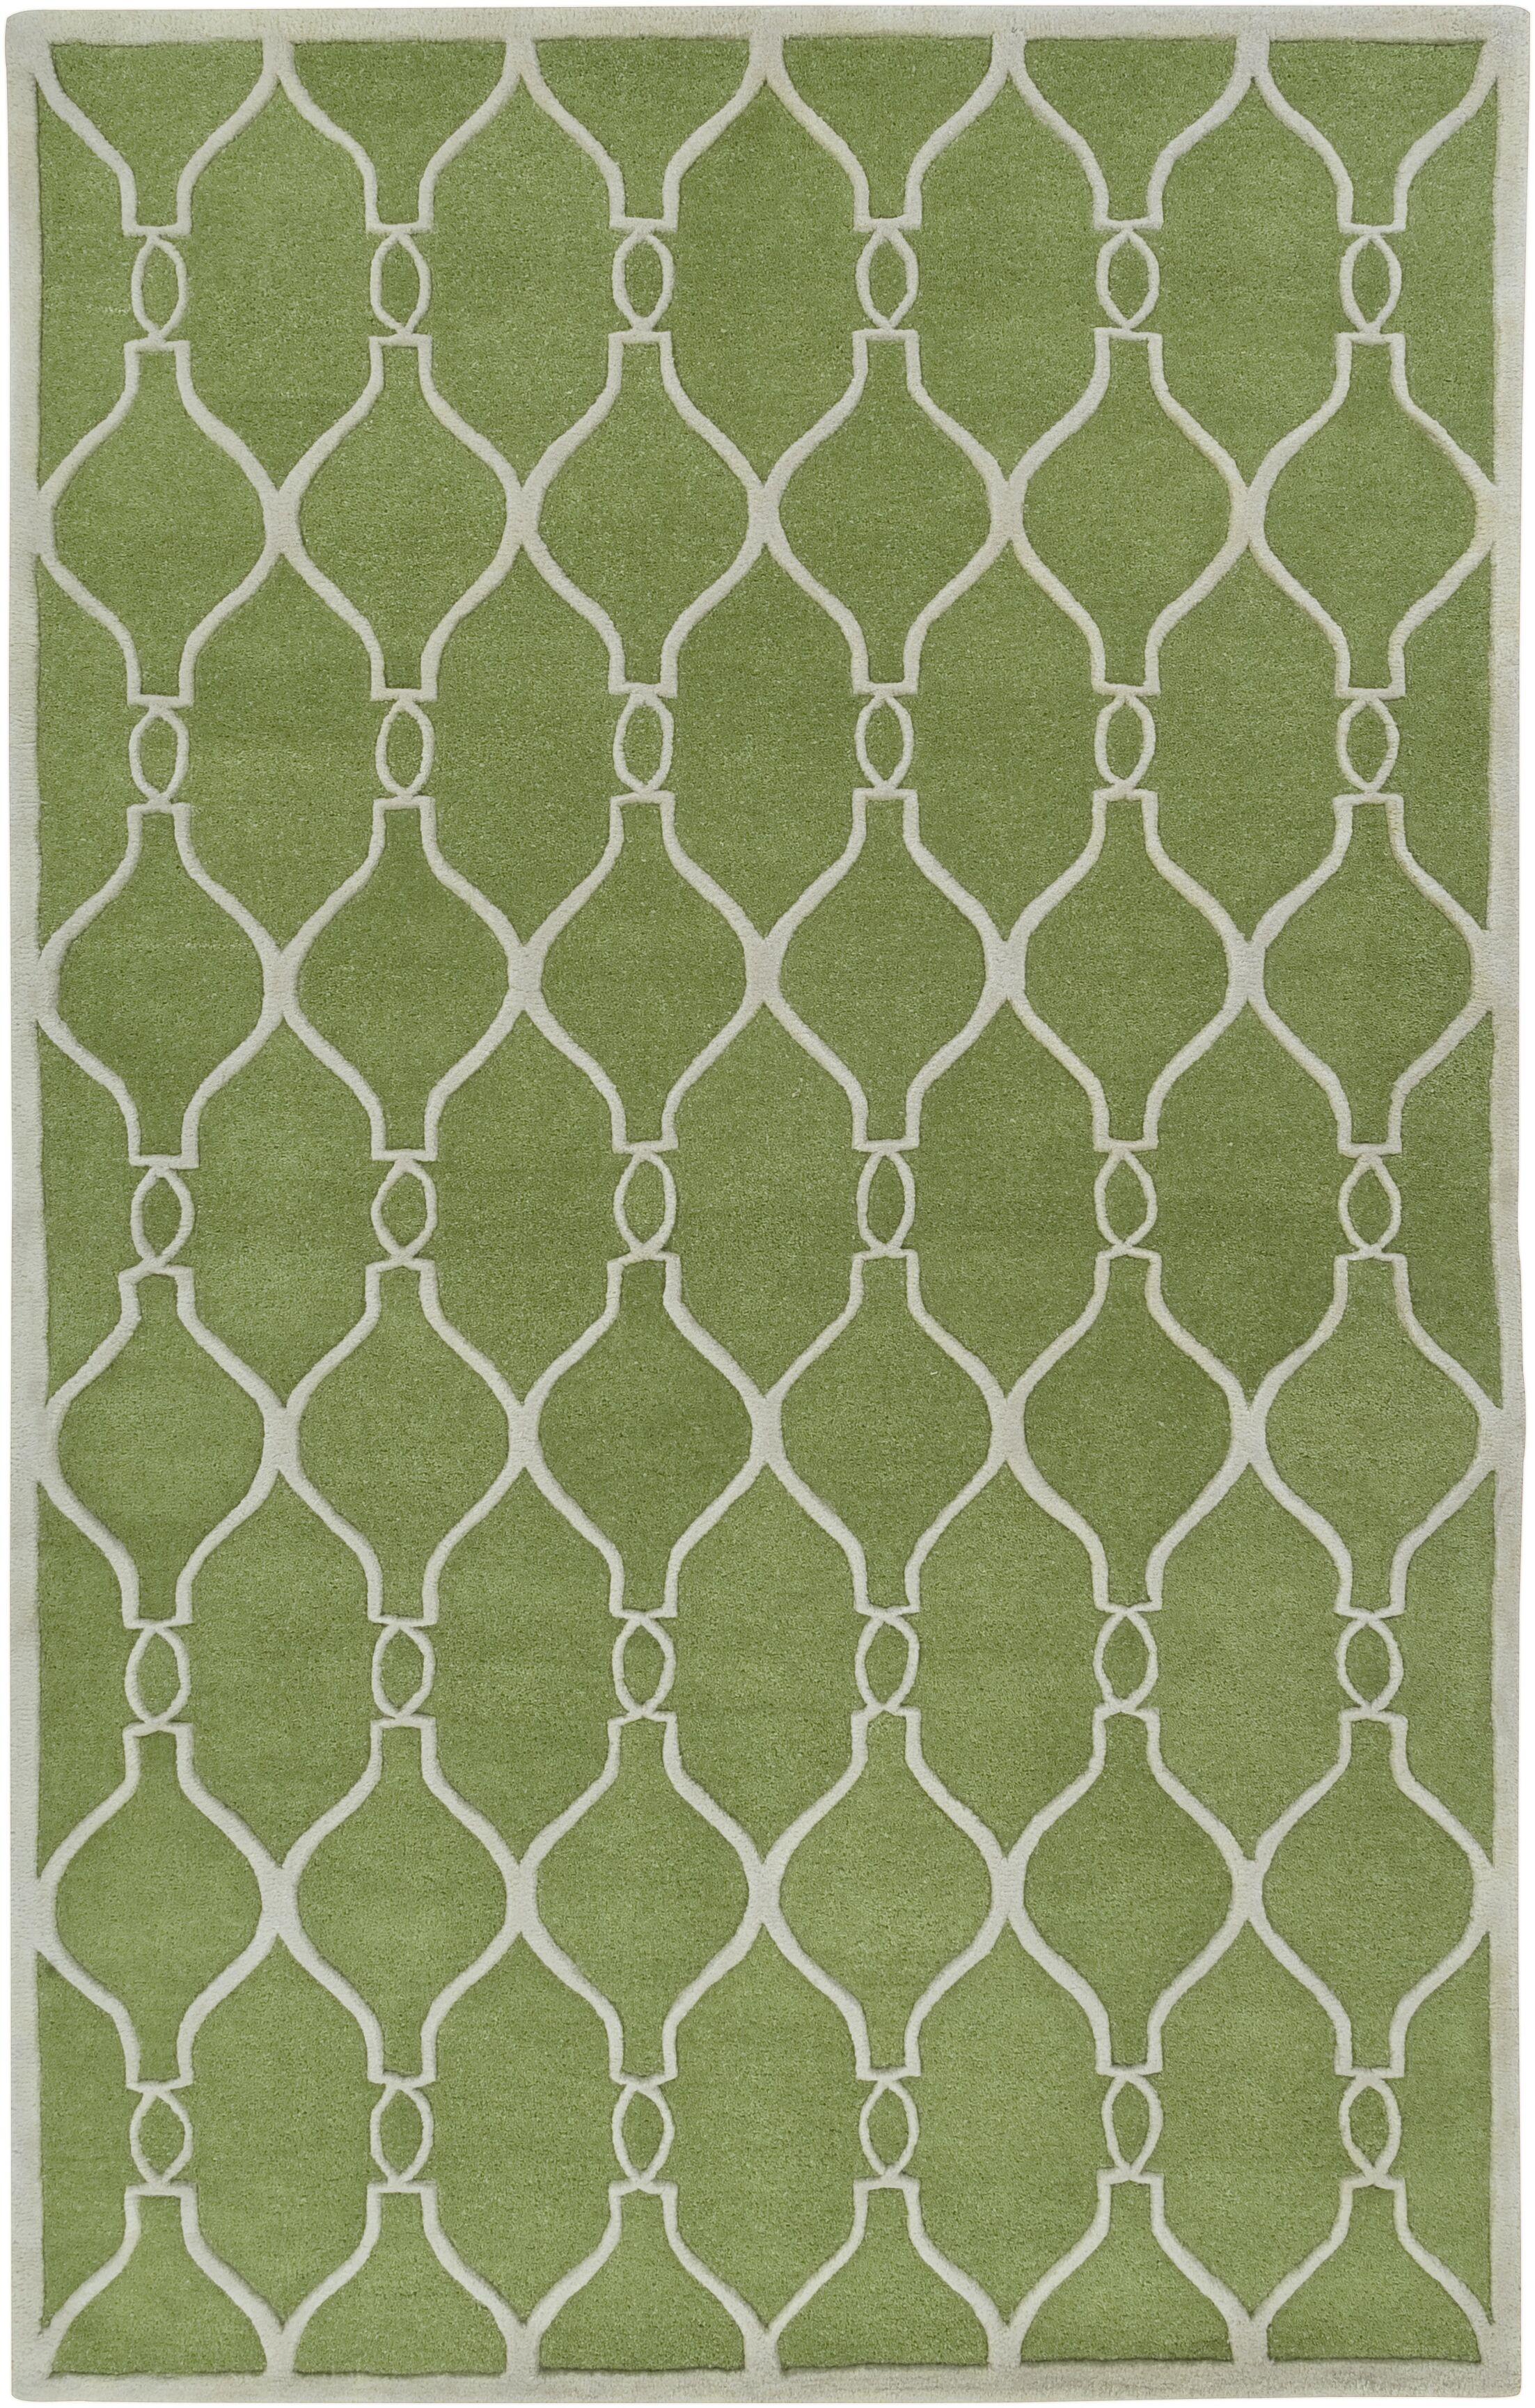 Medora Geometric Green Area Rug Rug Size: Rectangle 3'3